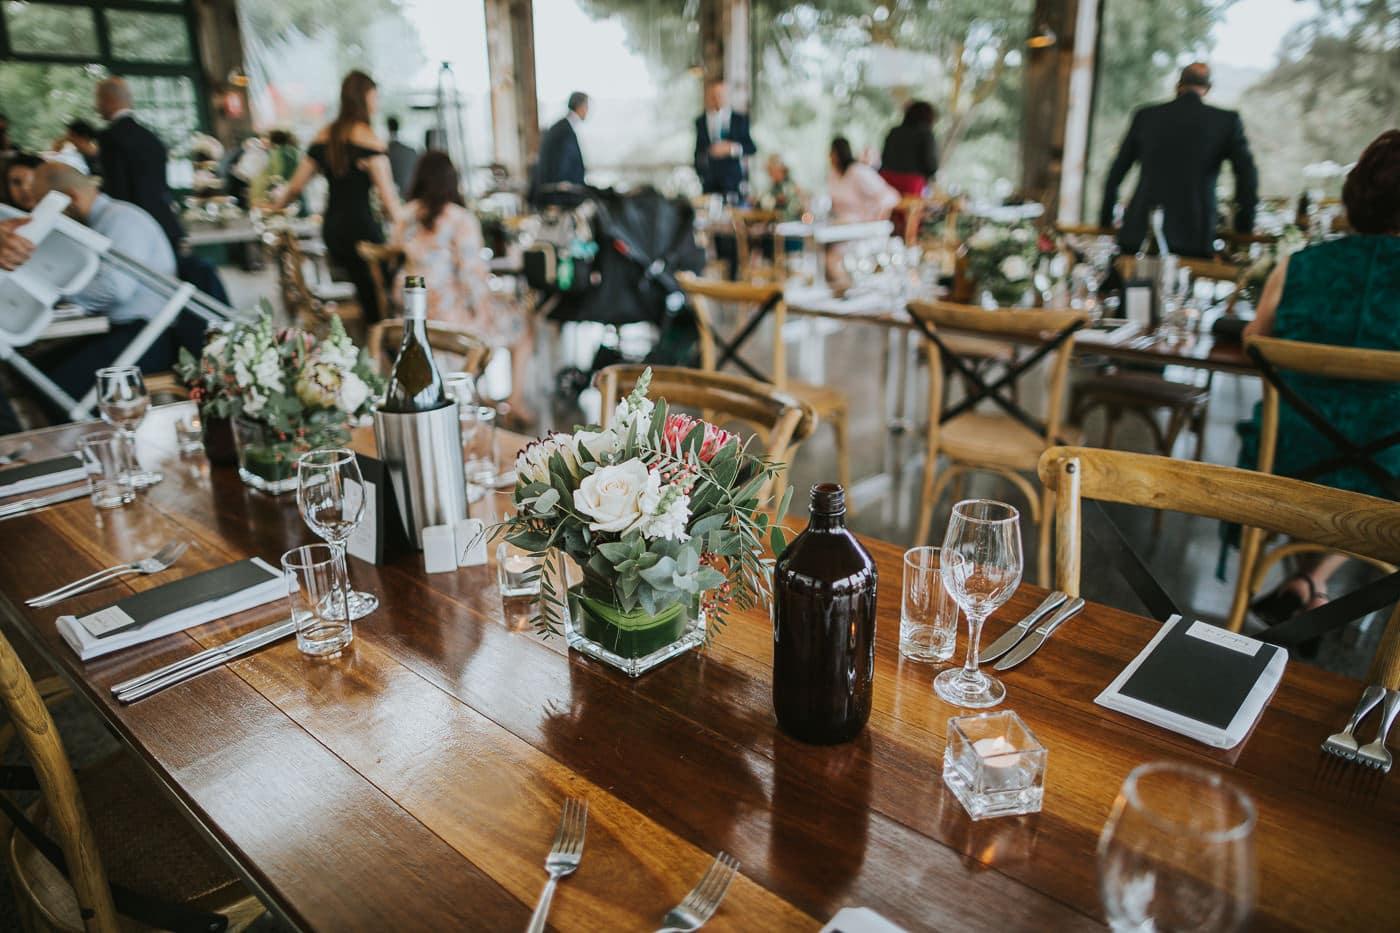 Decortaed wedding table at Flowerdale Estate